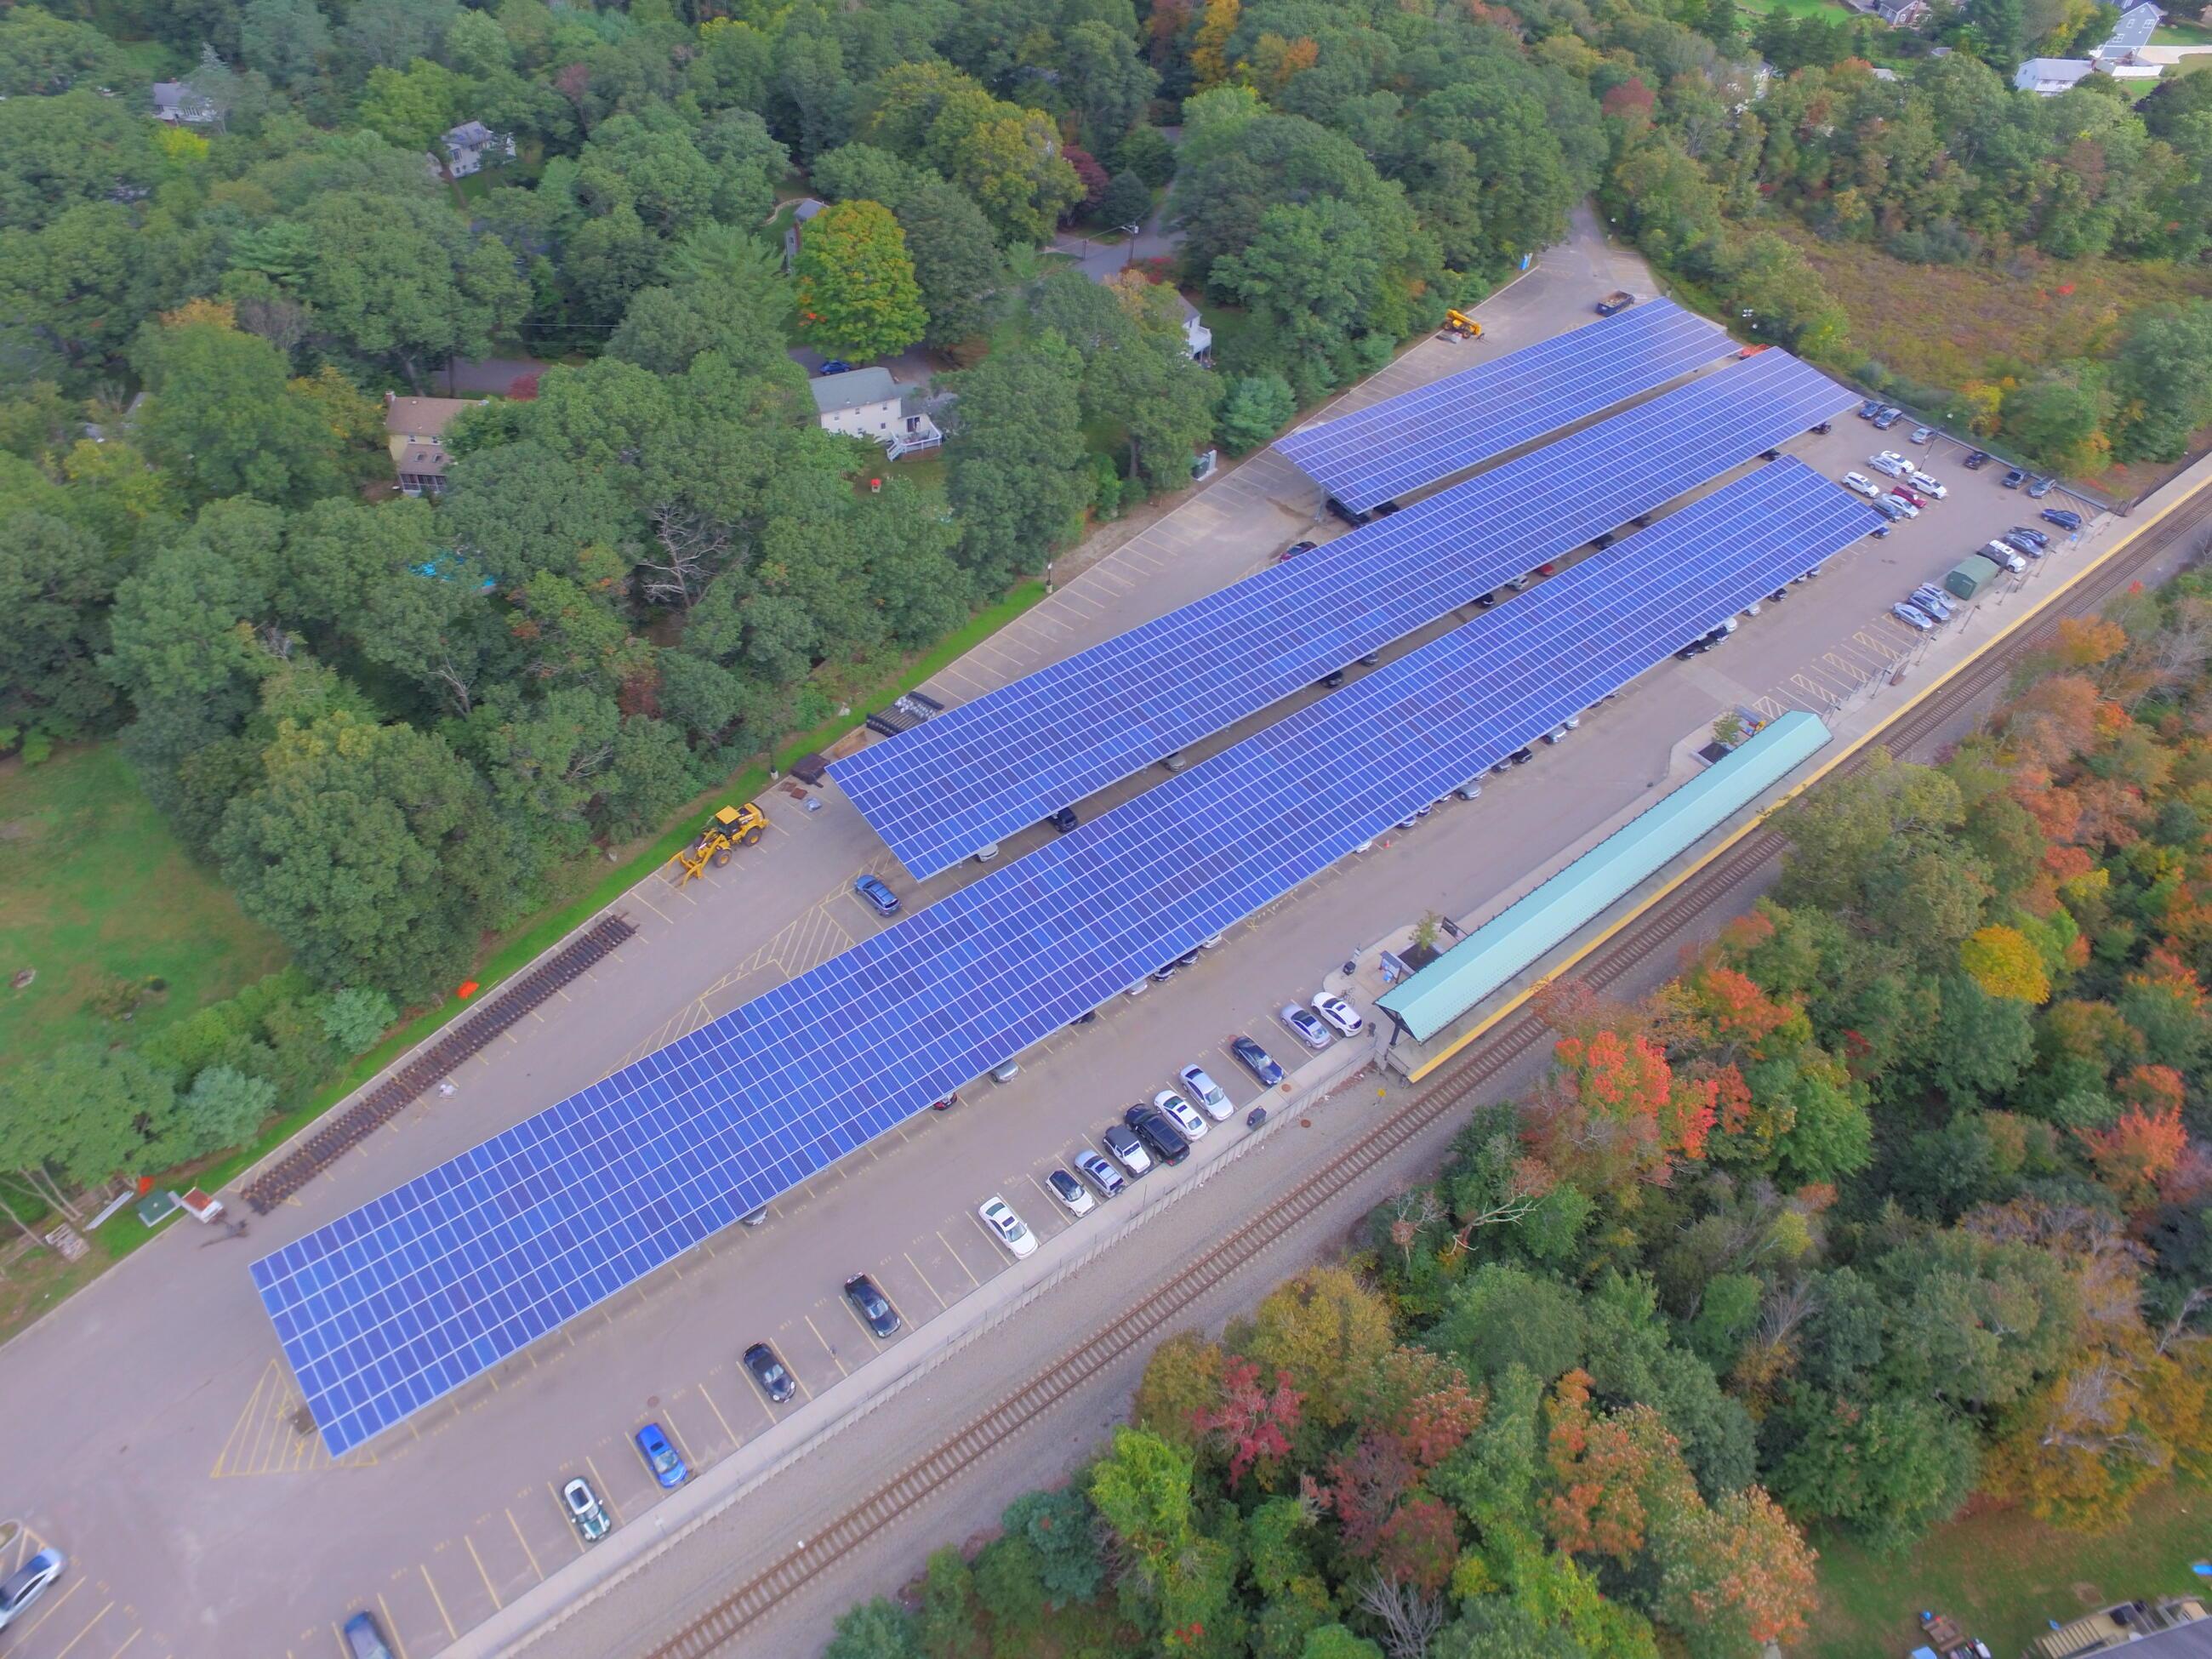 mbta solar canopy at nantasket station parking lot